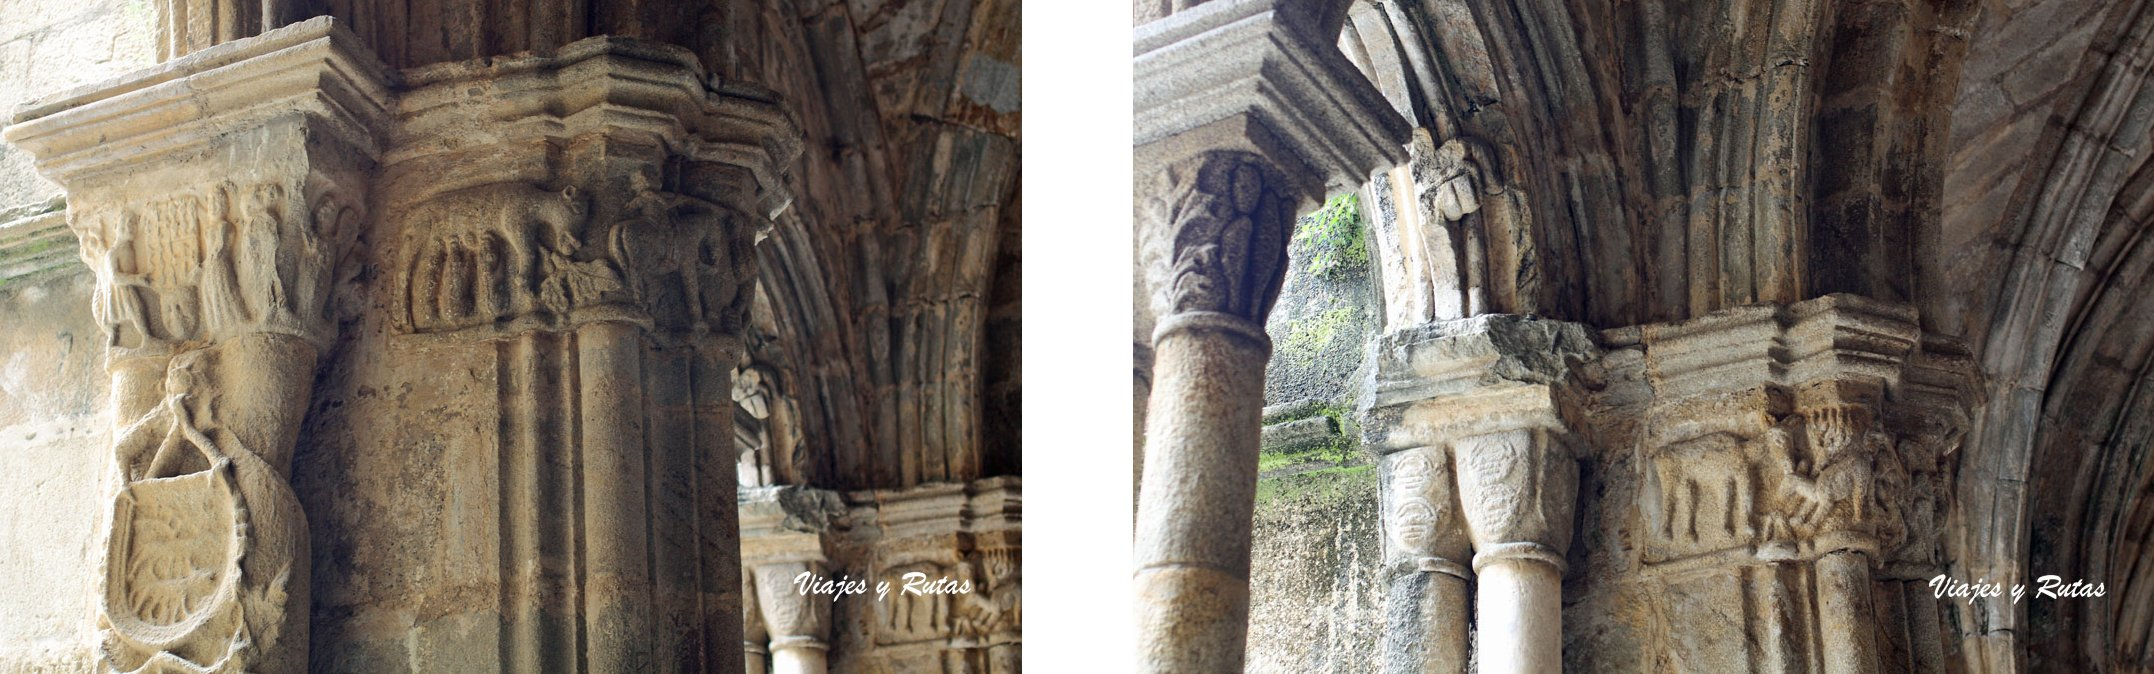 Capiteles del claustro de la Catedral de Plasencia